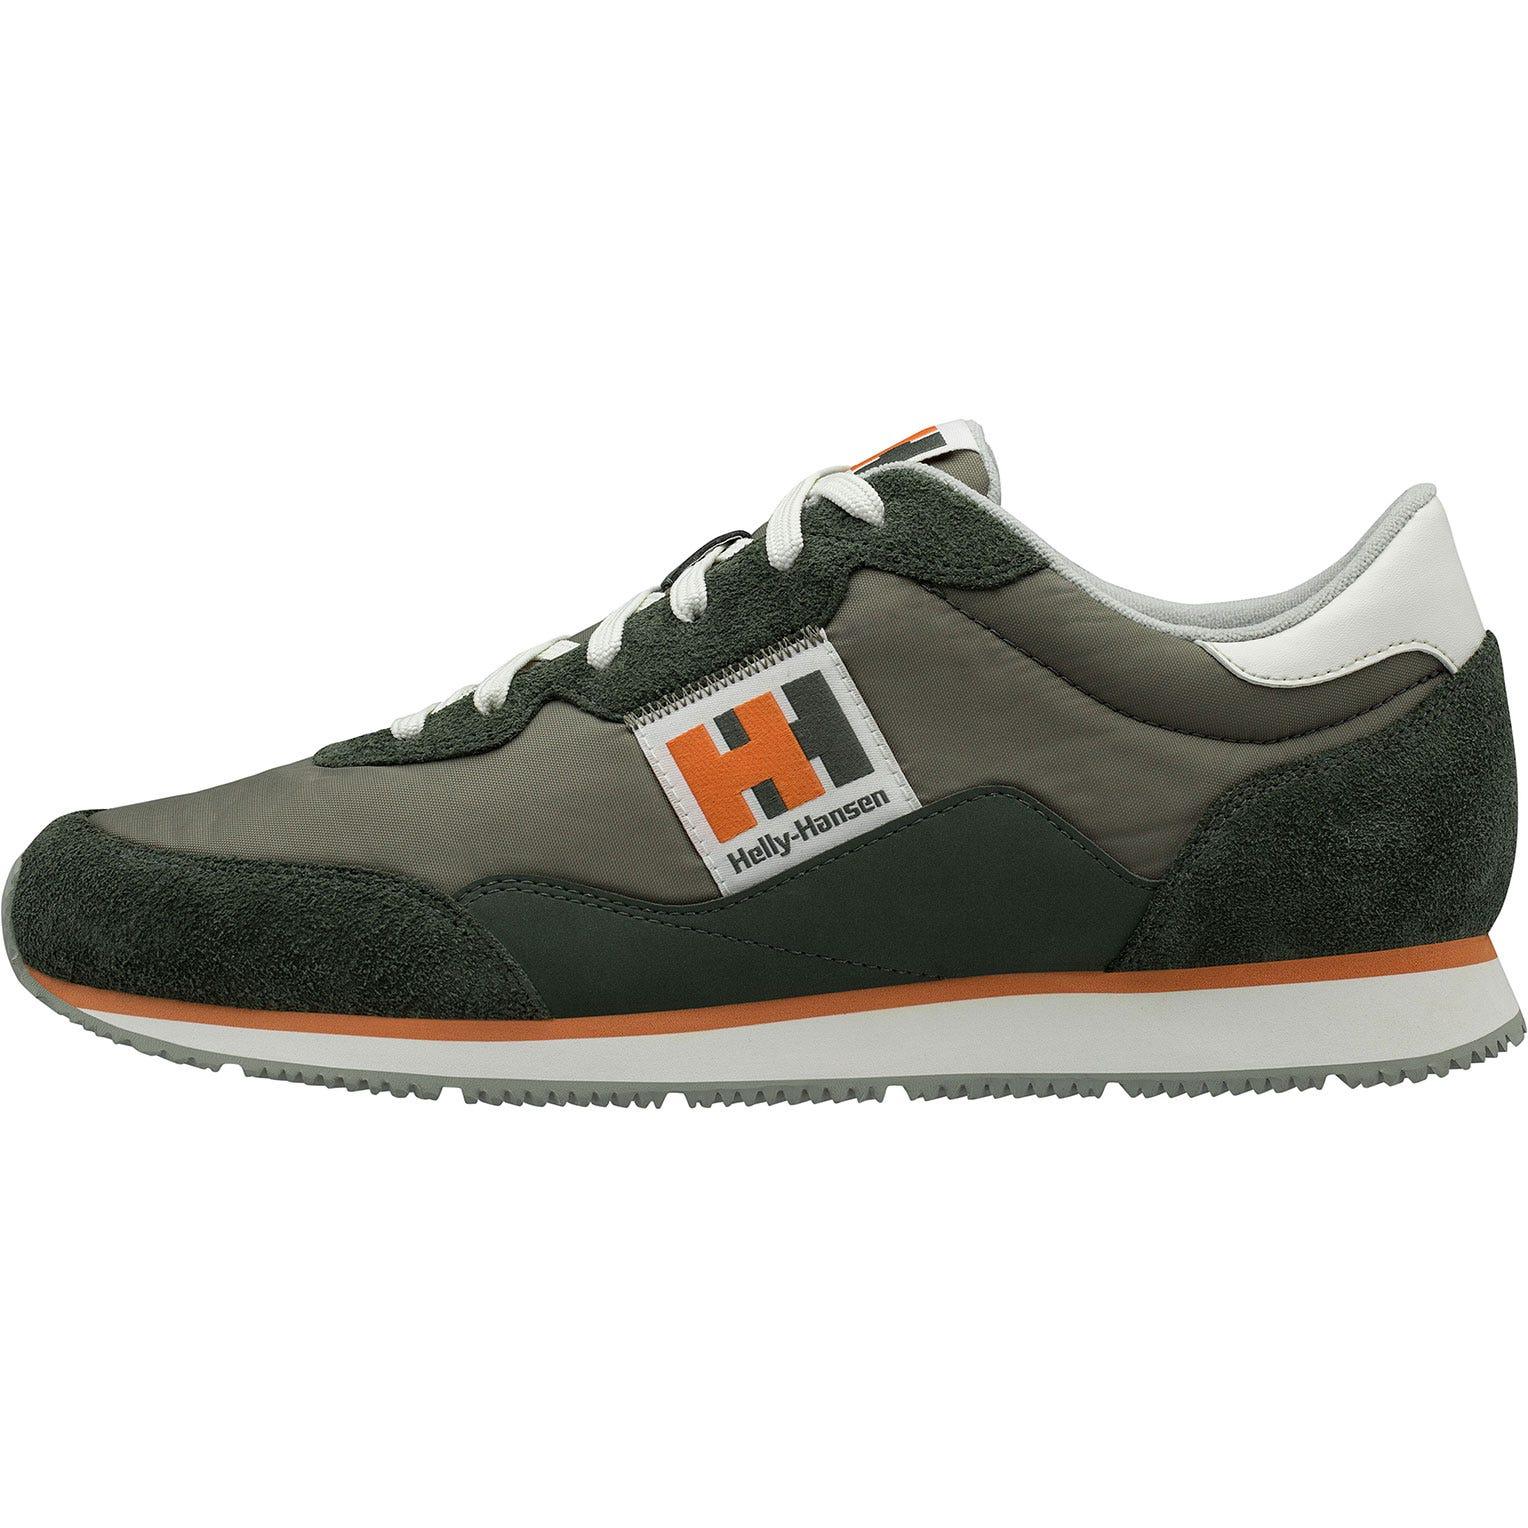 Helly Hansen Ripples Lowcut Sneaker Mens Green 44/10